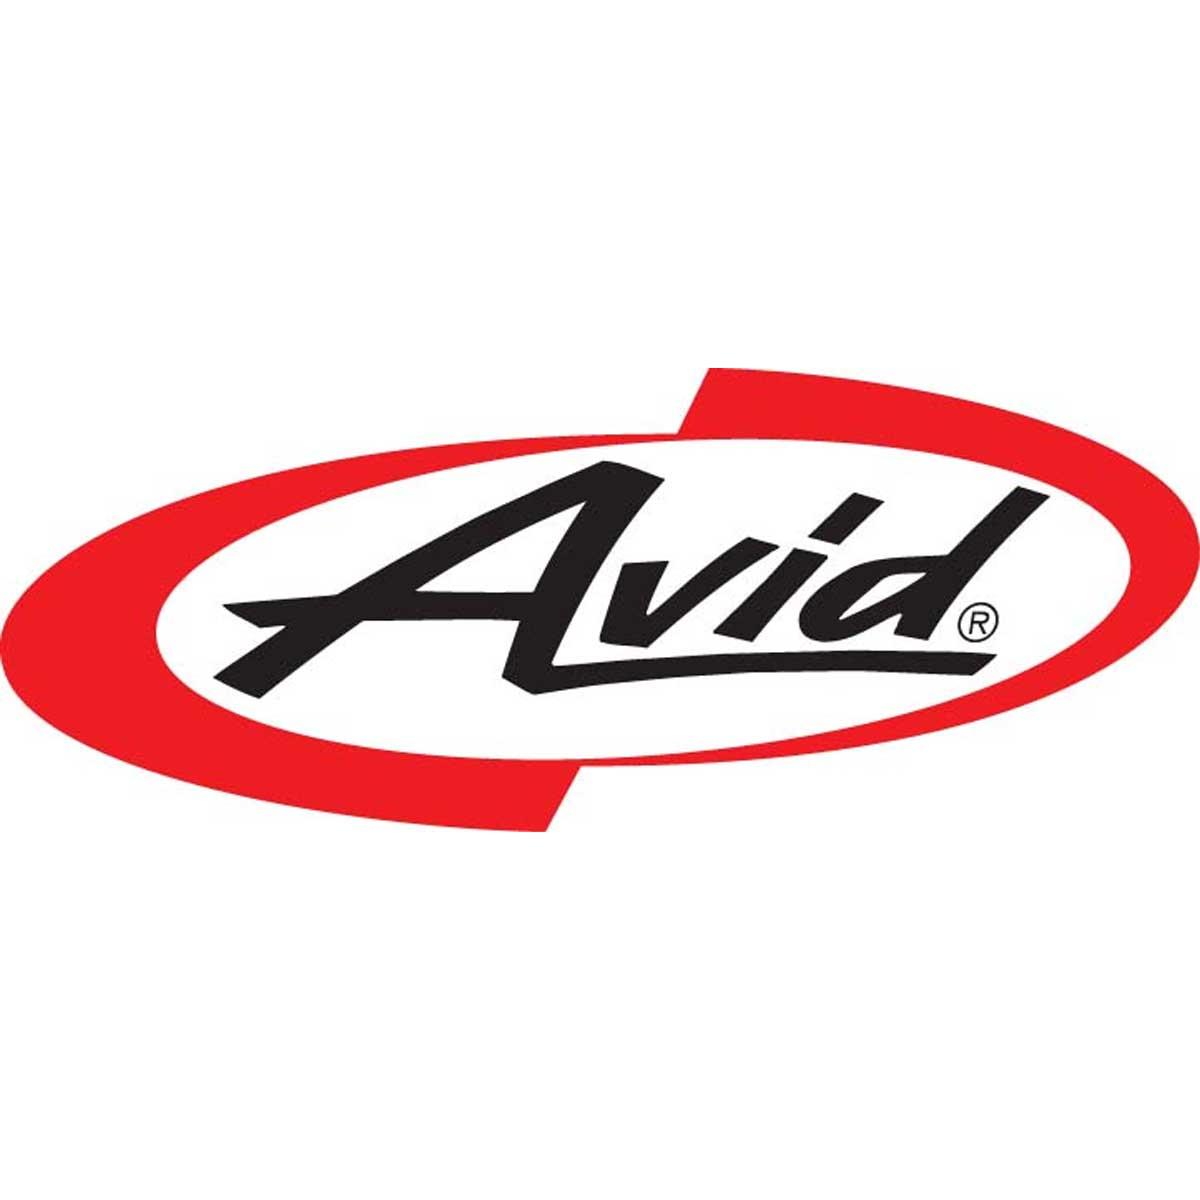 Avid Elixir DB1 Bicycle Disc Brake Caliper Parts Kit - 11.5018.007.004